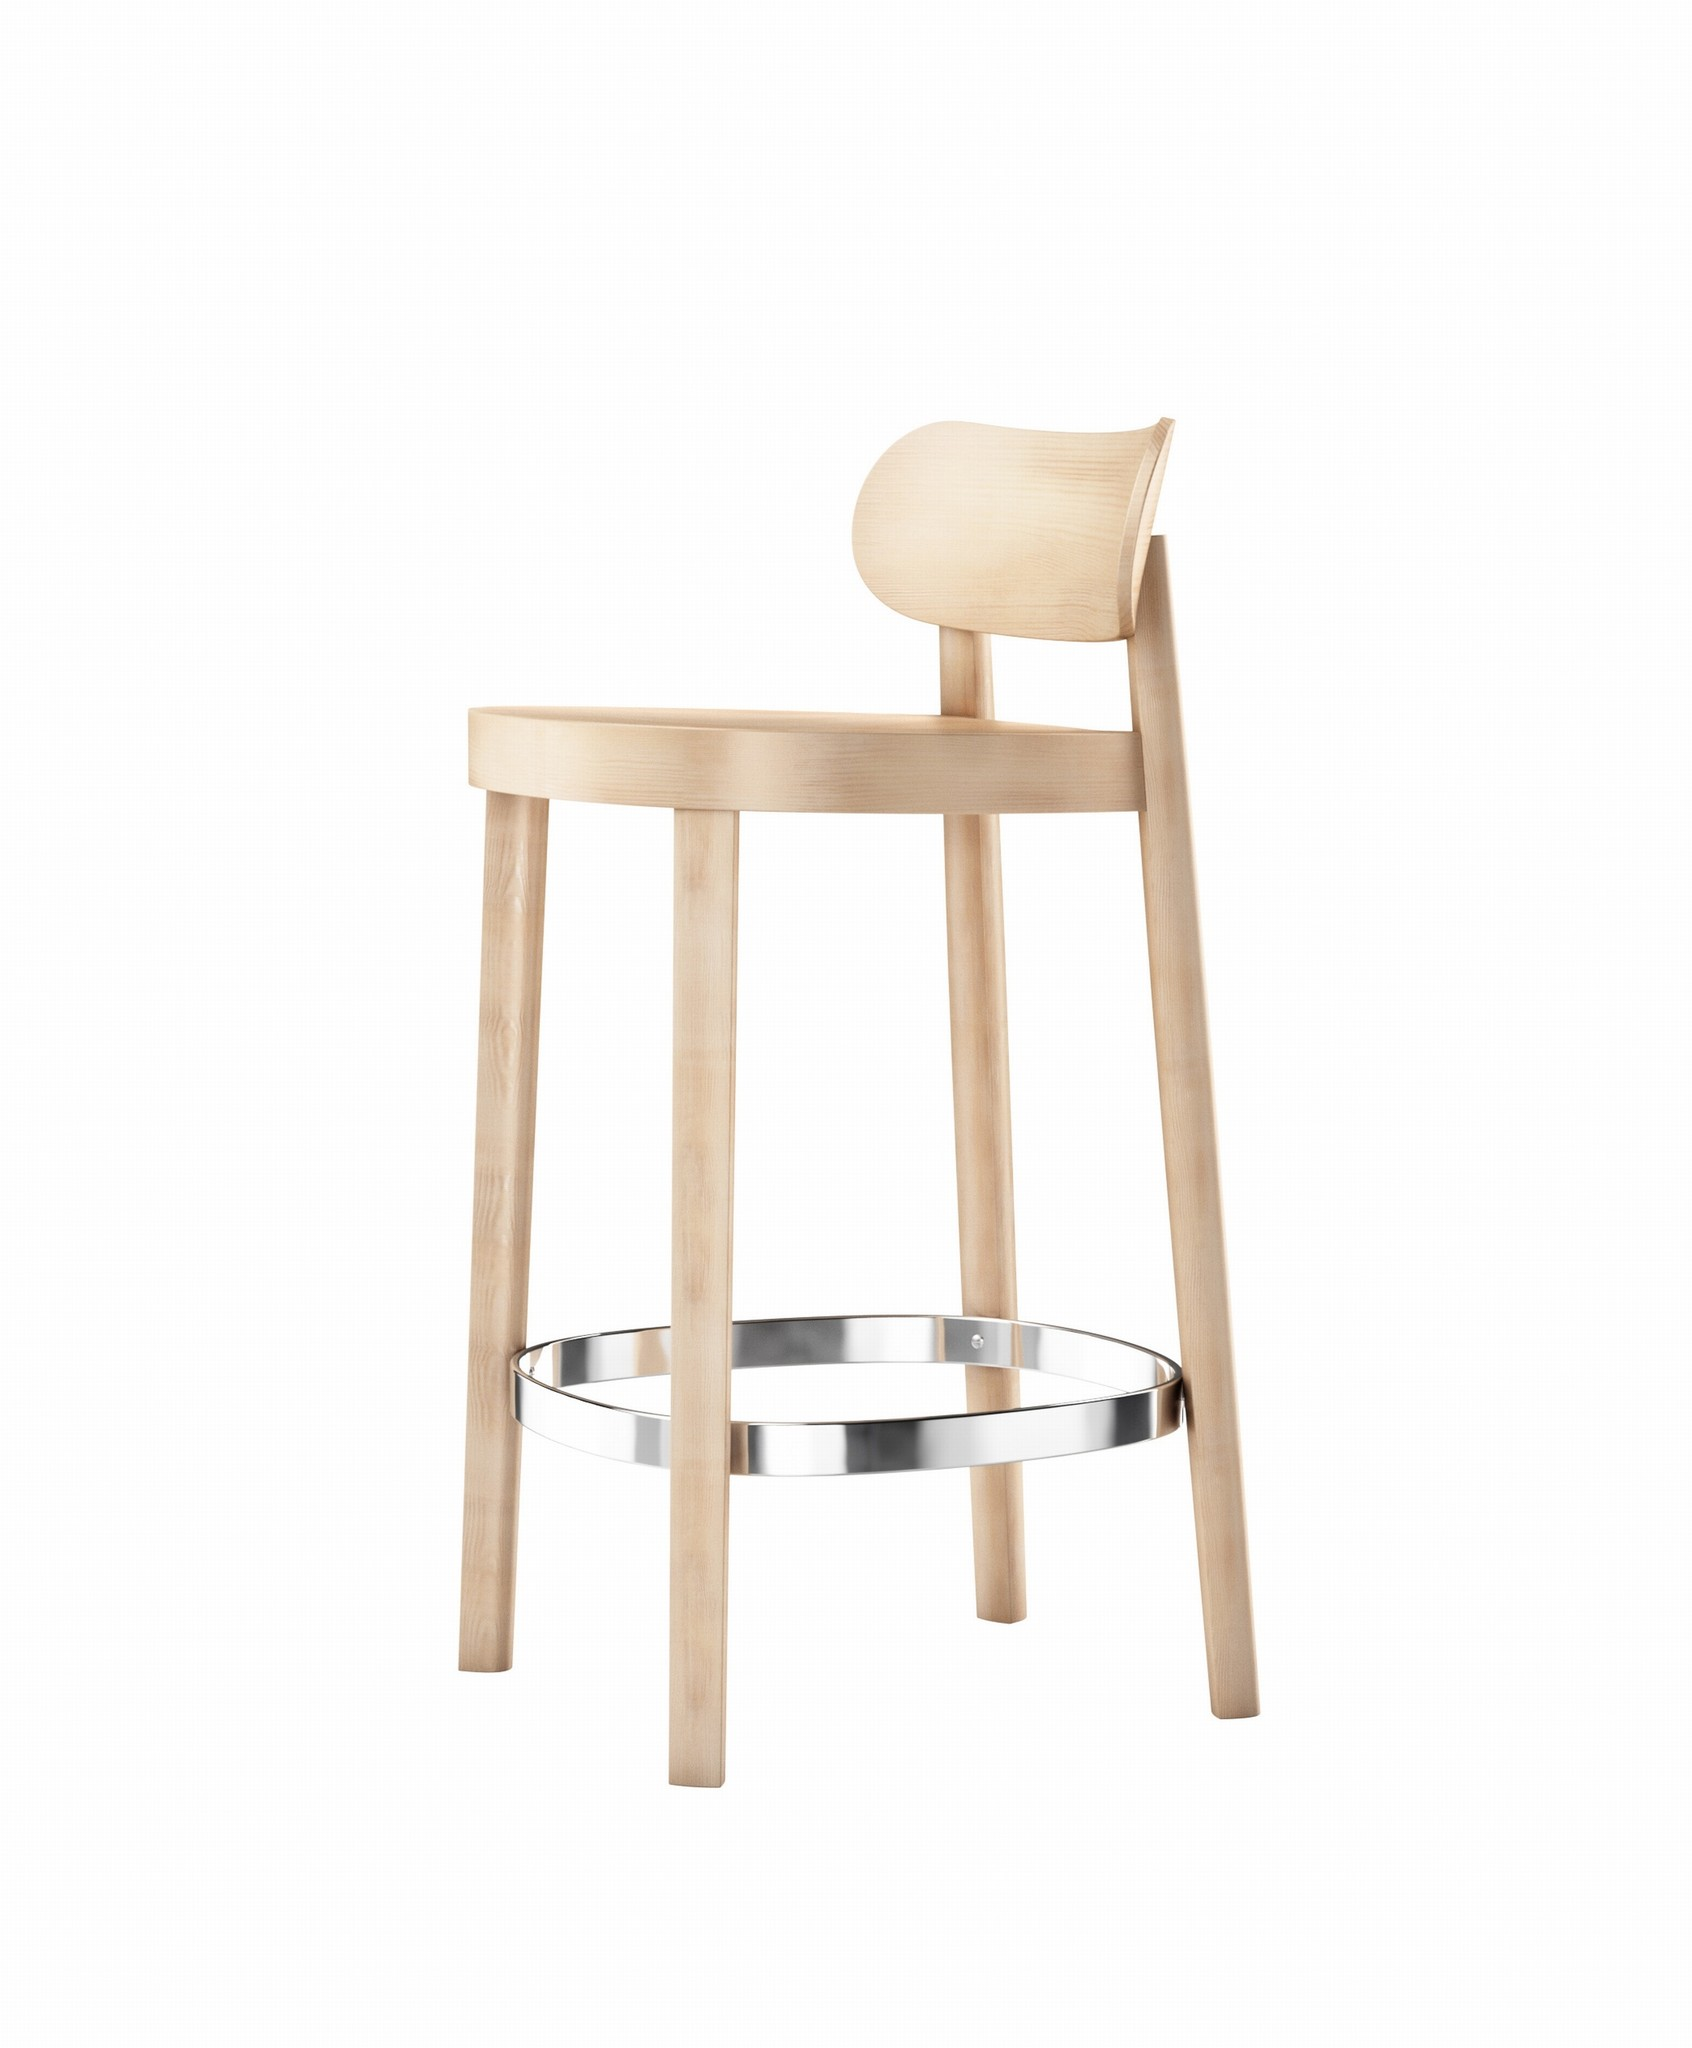 Thonet 118 stoel Design Online Meubels